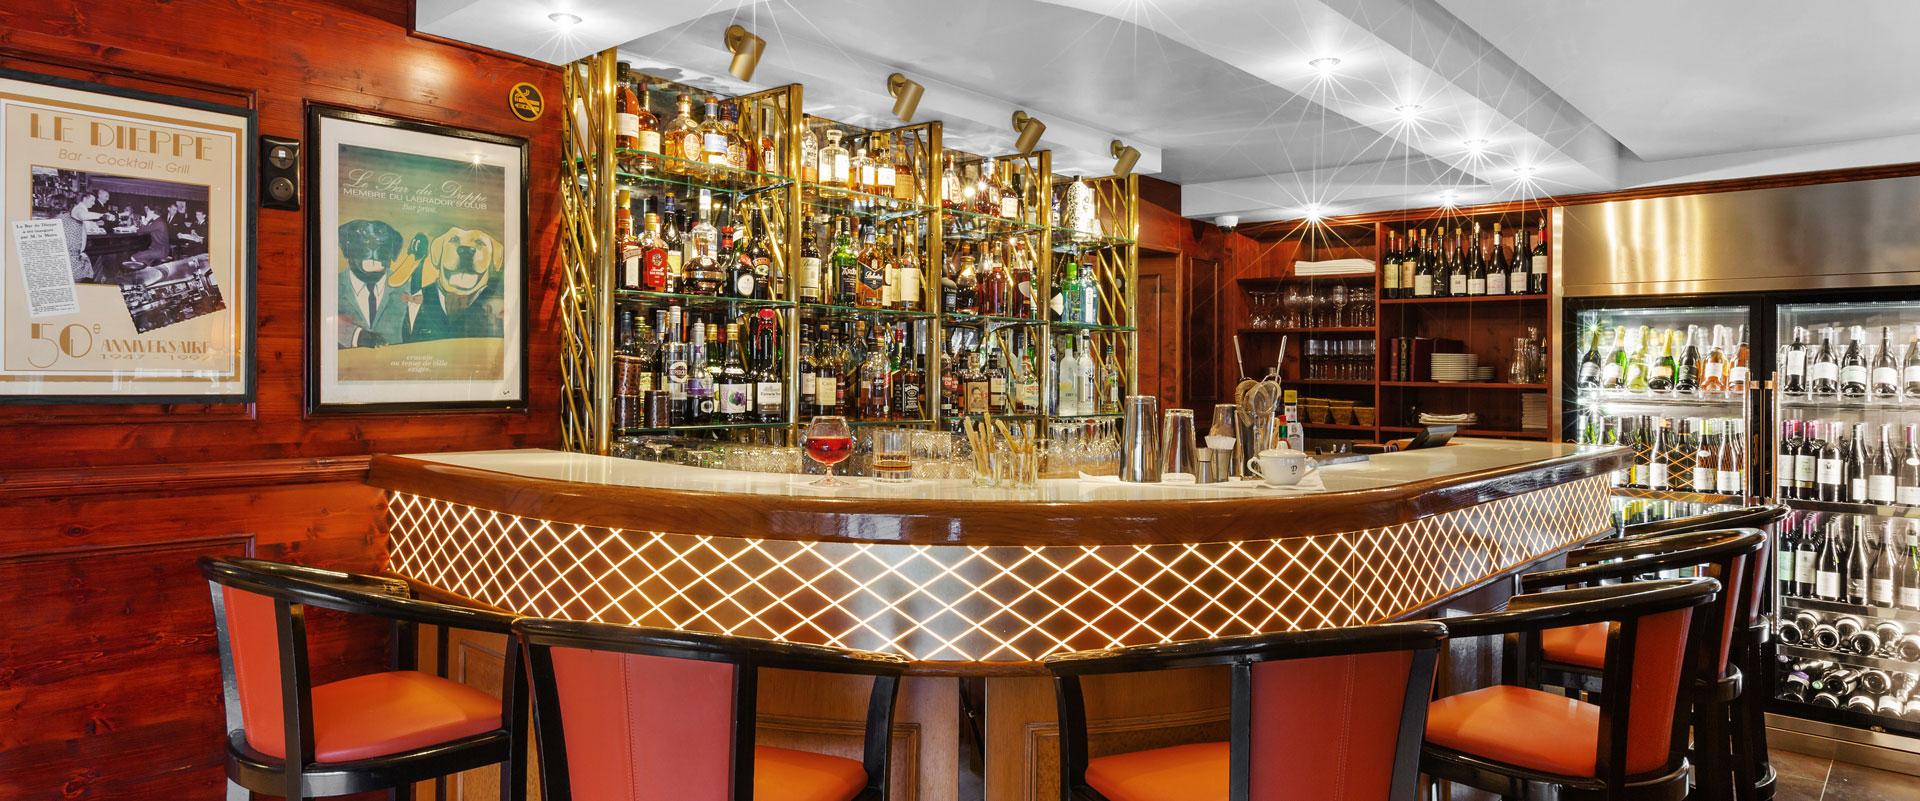 9-hotel-de-dieppe-1880-rouen-normandie-bar-grill-1920x801